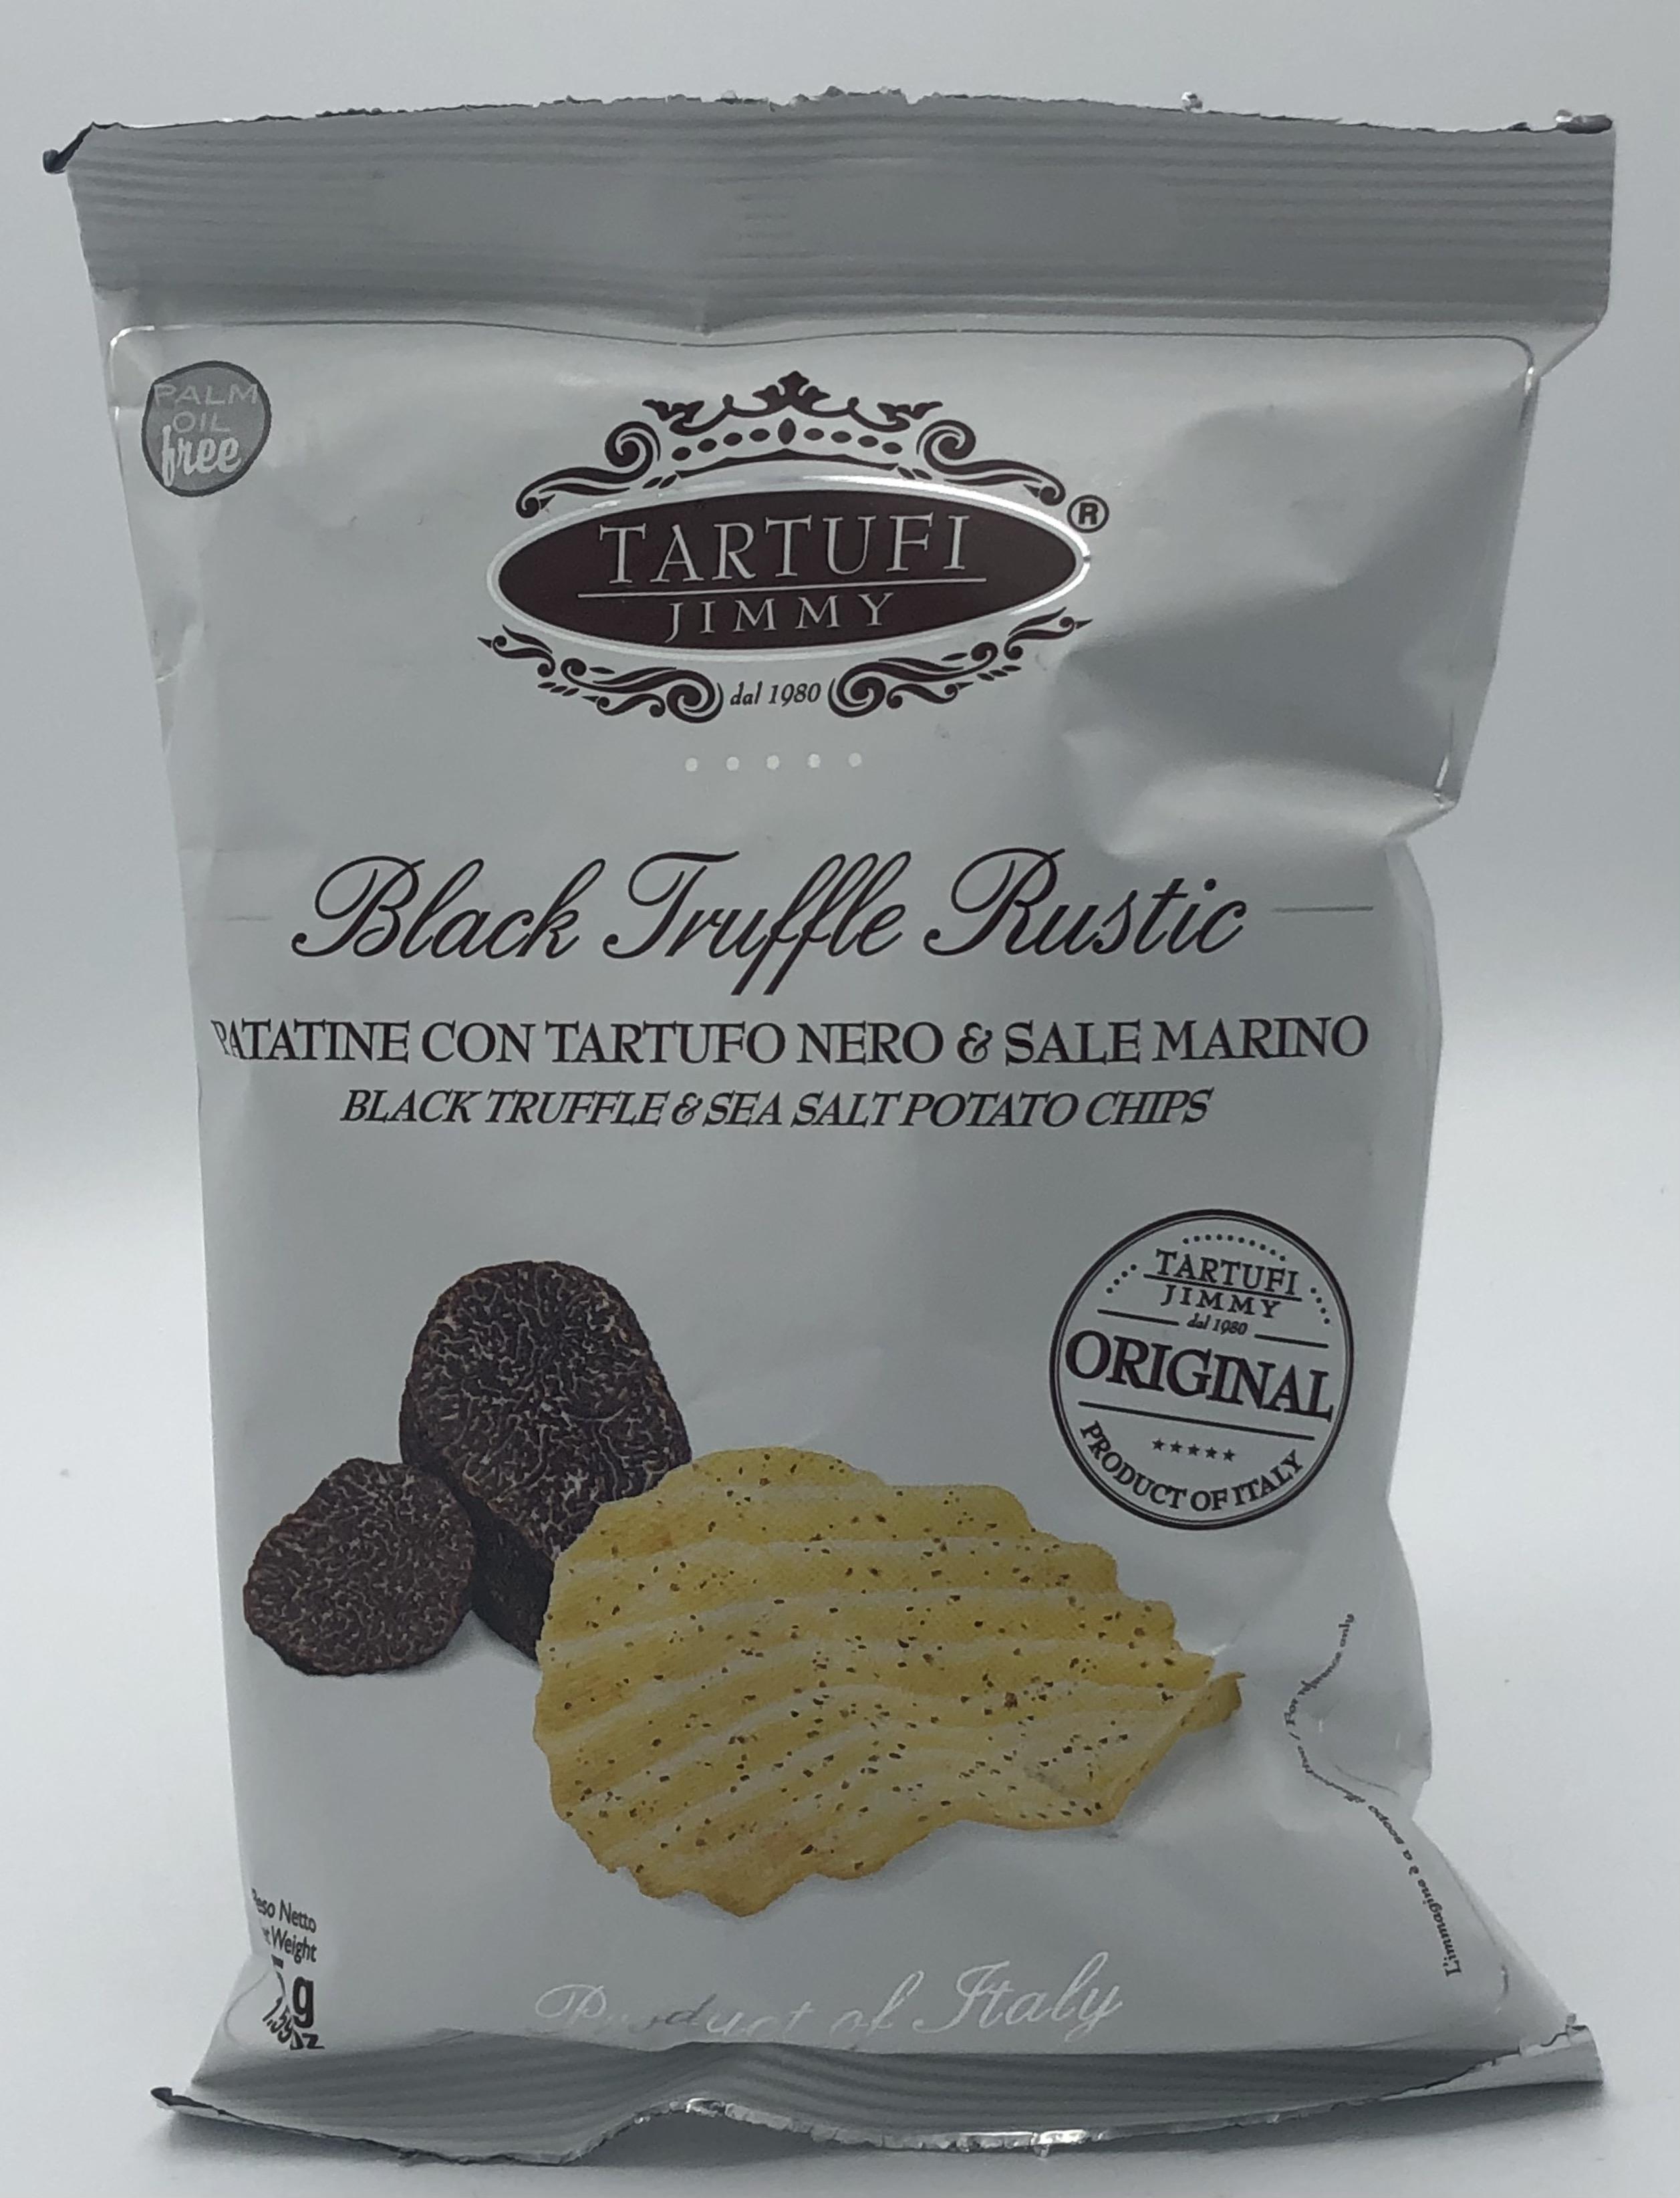 Jimmy Tartufi - Patatine con Tartufo Nero GR.45